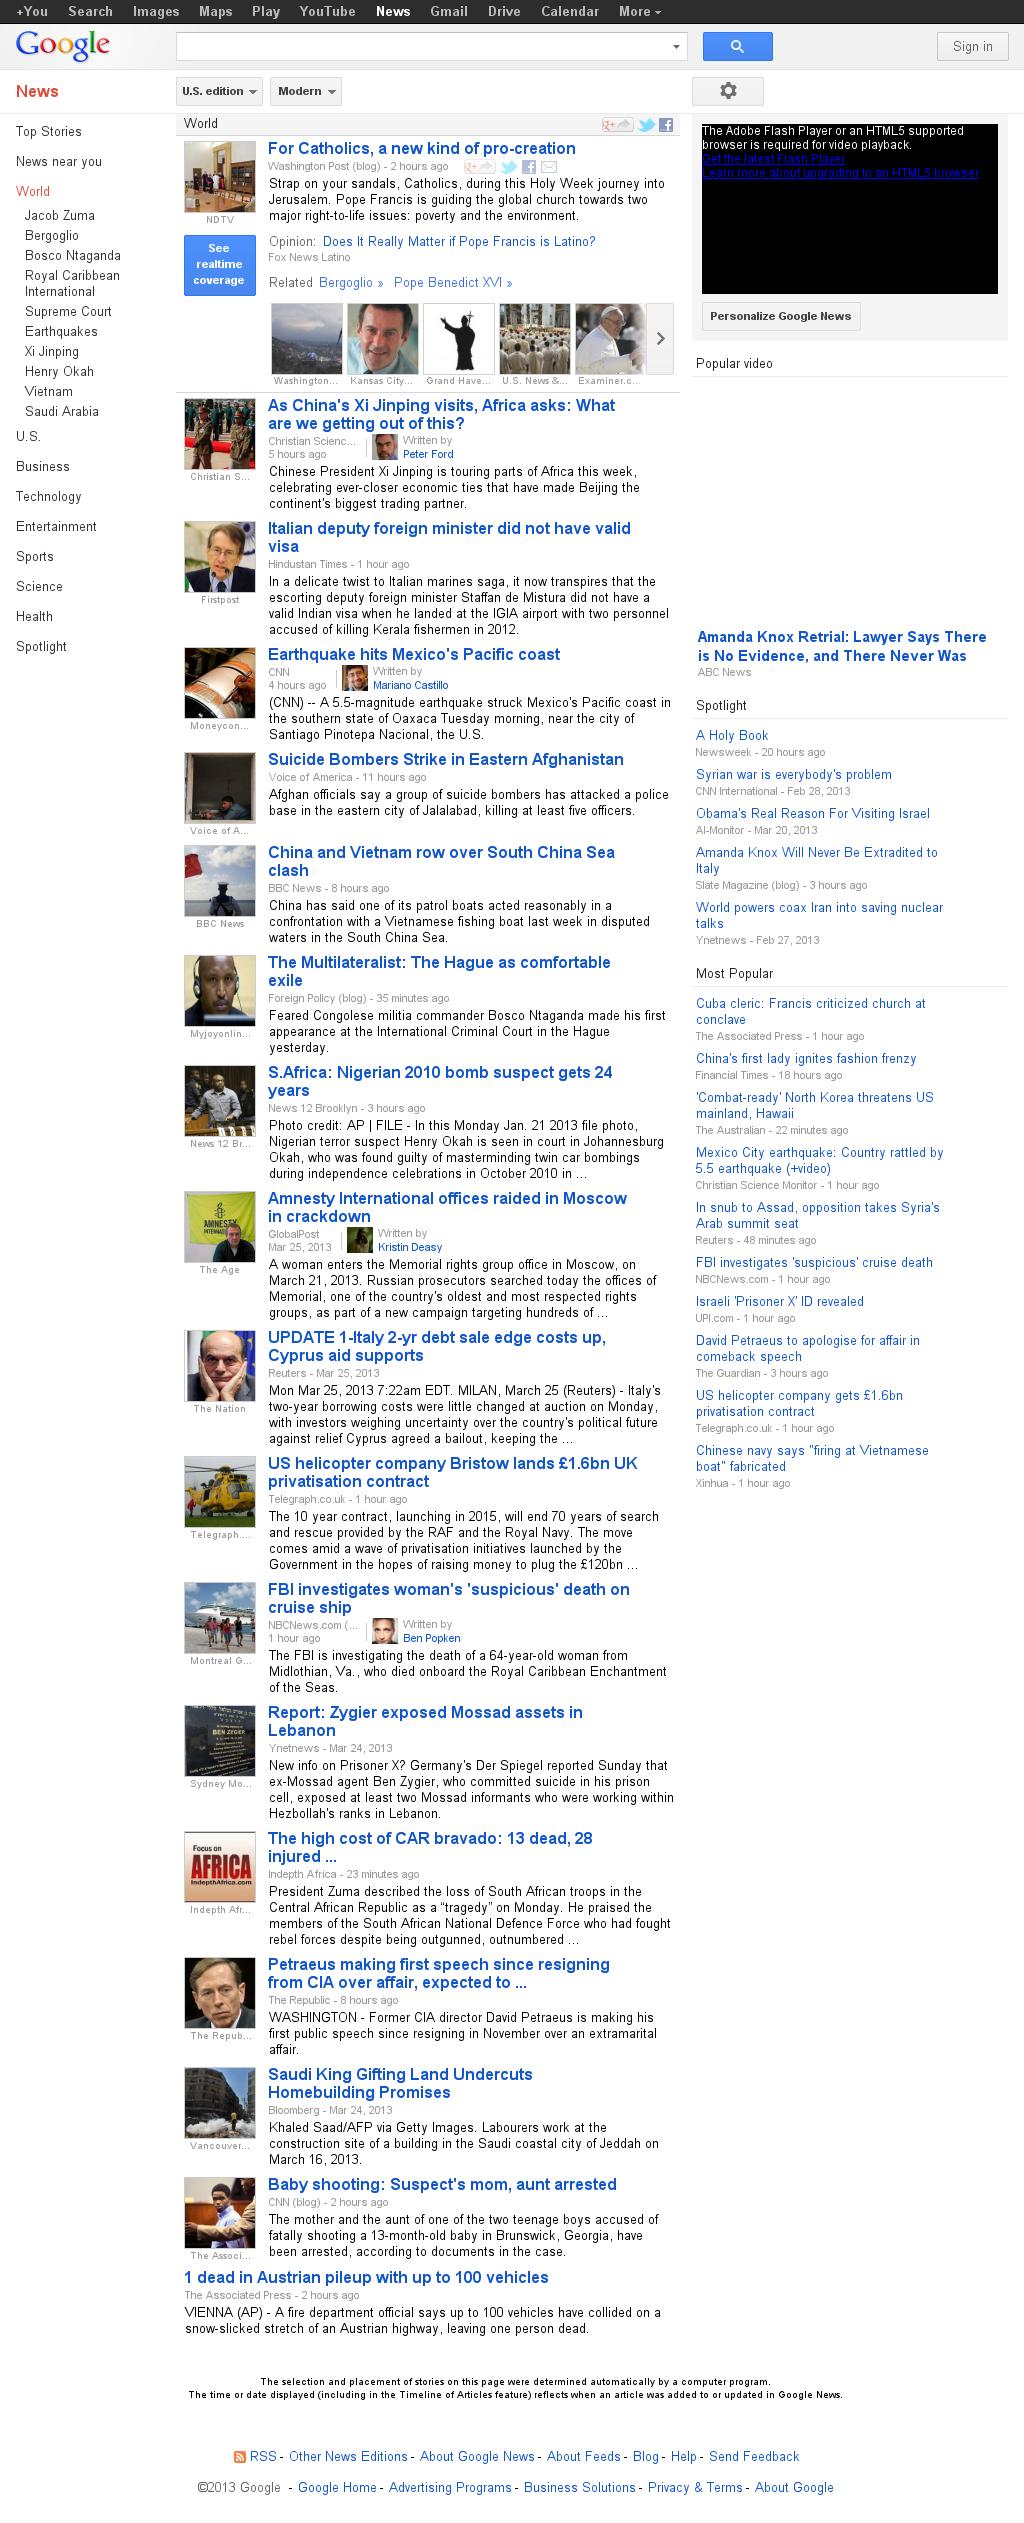 Google News: World at Tuesday March 26, 2013, 8:15 p.m. UTC